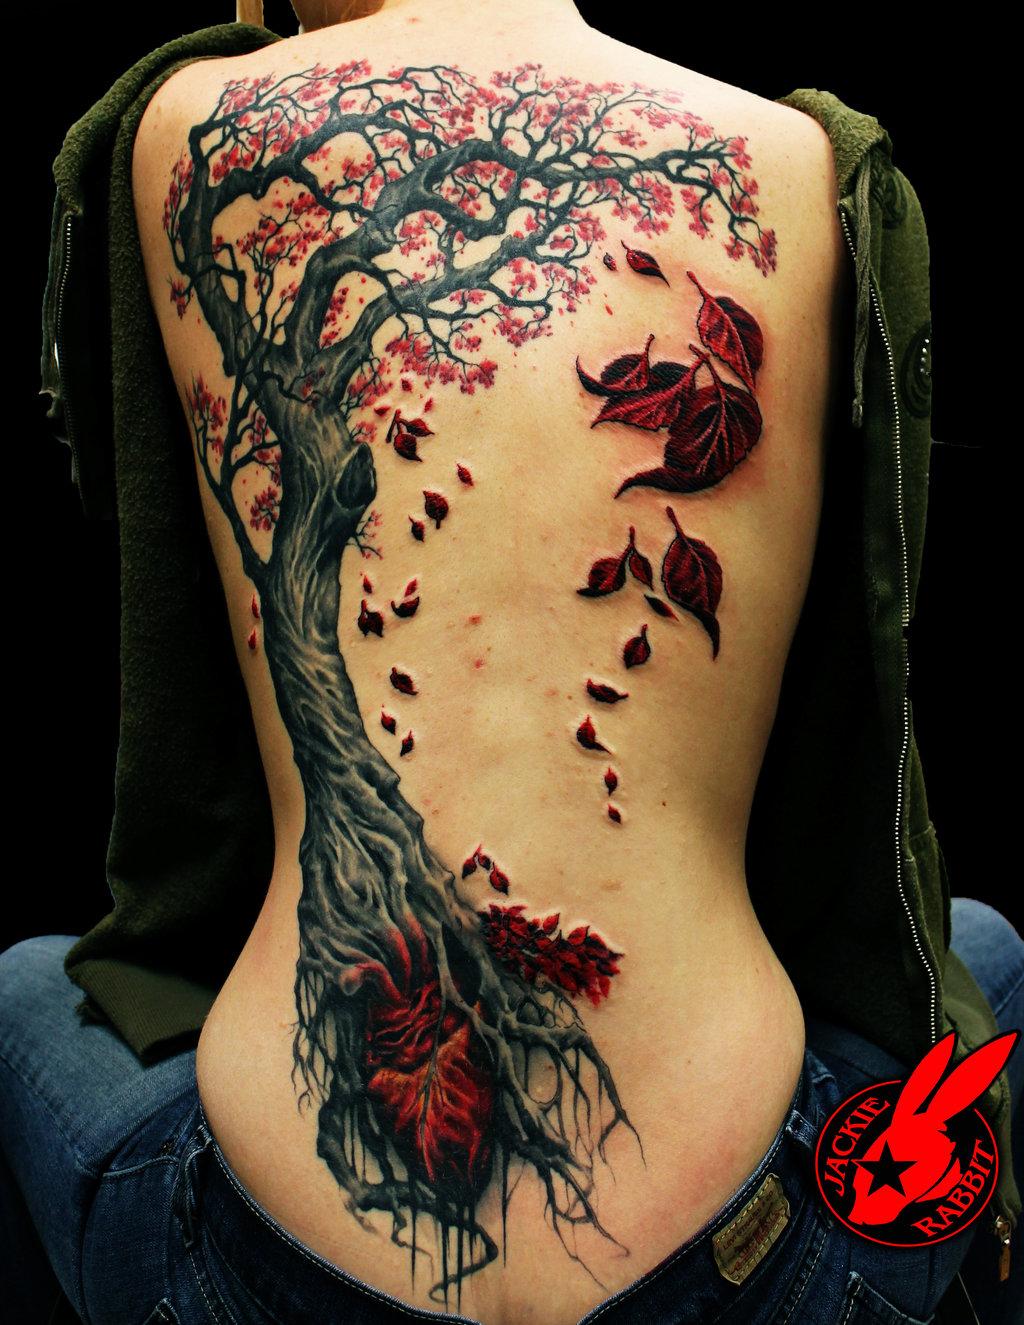 heart_tree_tattoo_by_jackie_rabbit_by_jackierabbit12-d771tdi